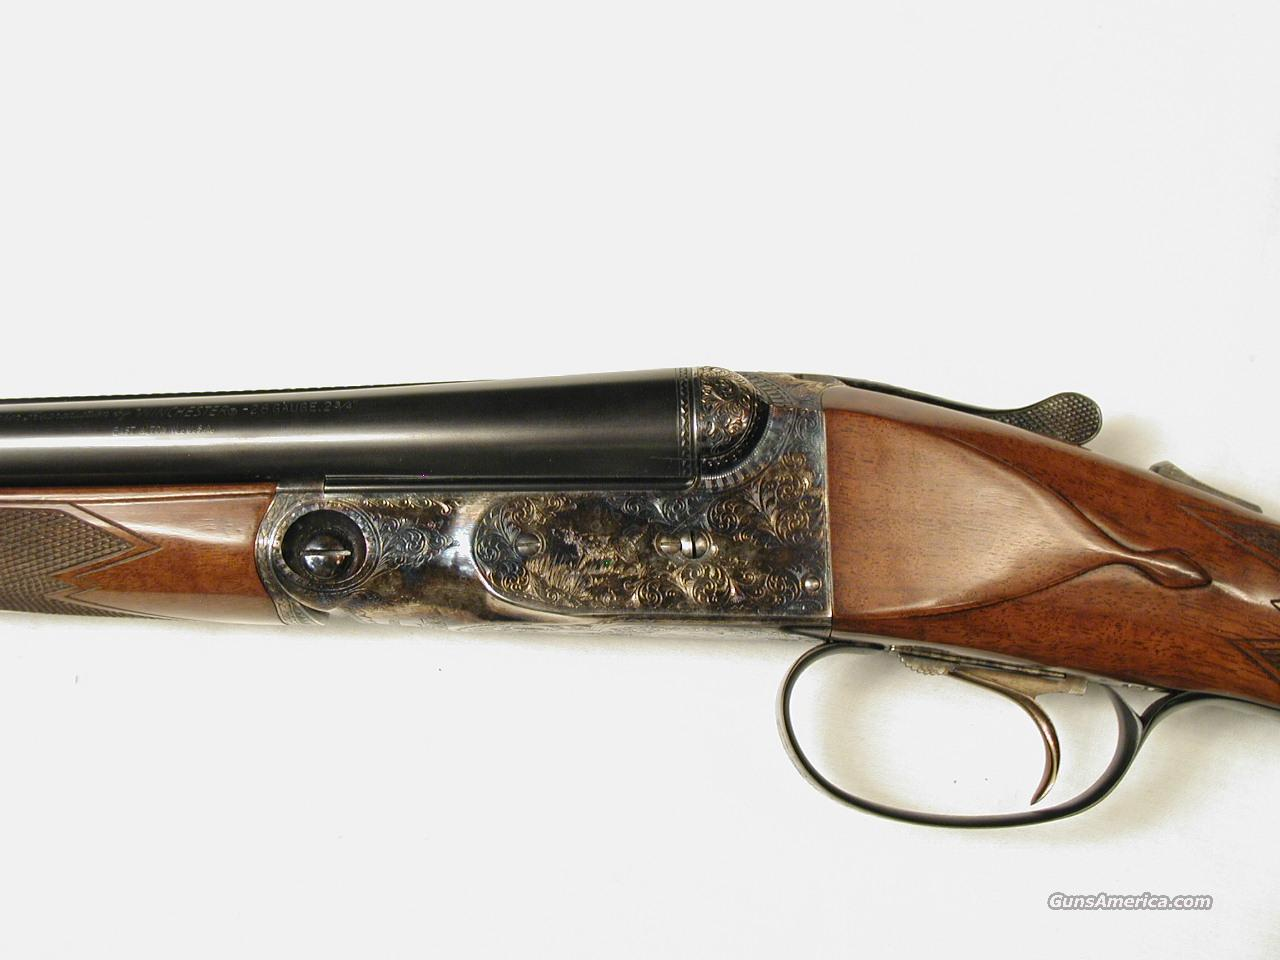 DHE 28 GAUGE 2 BARREL SET  Guns > Shotguns > Parker Reproductions Shotguns